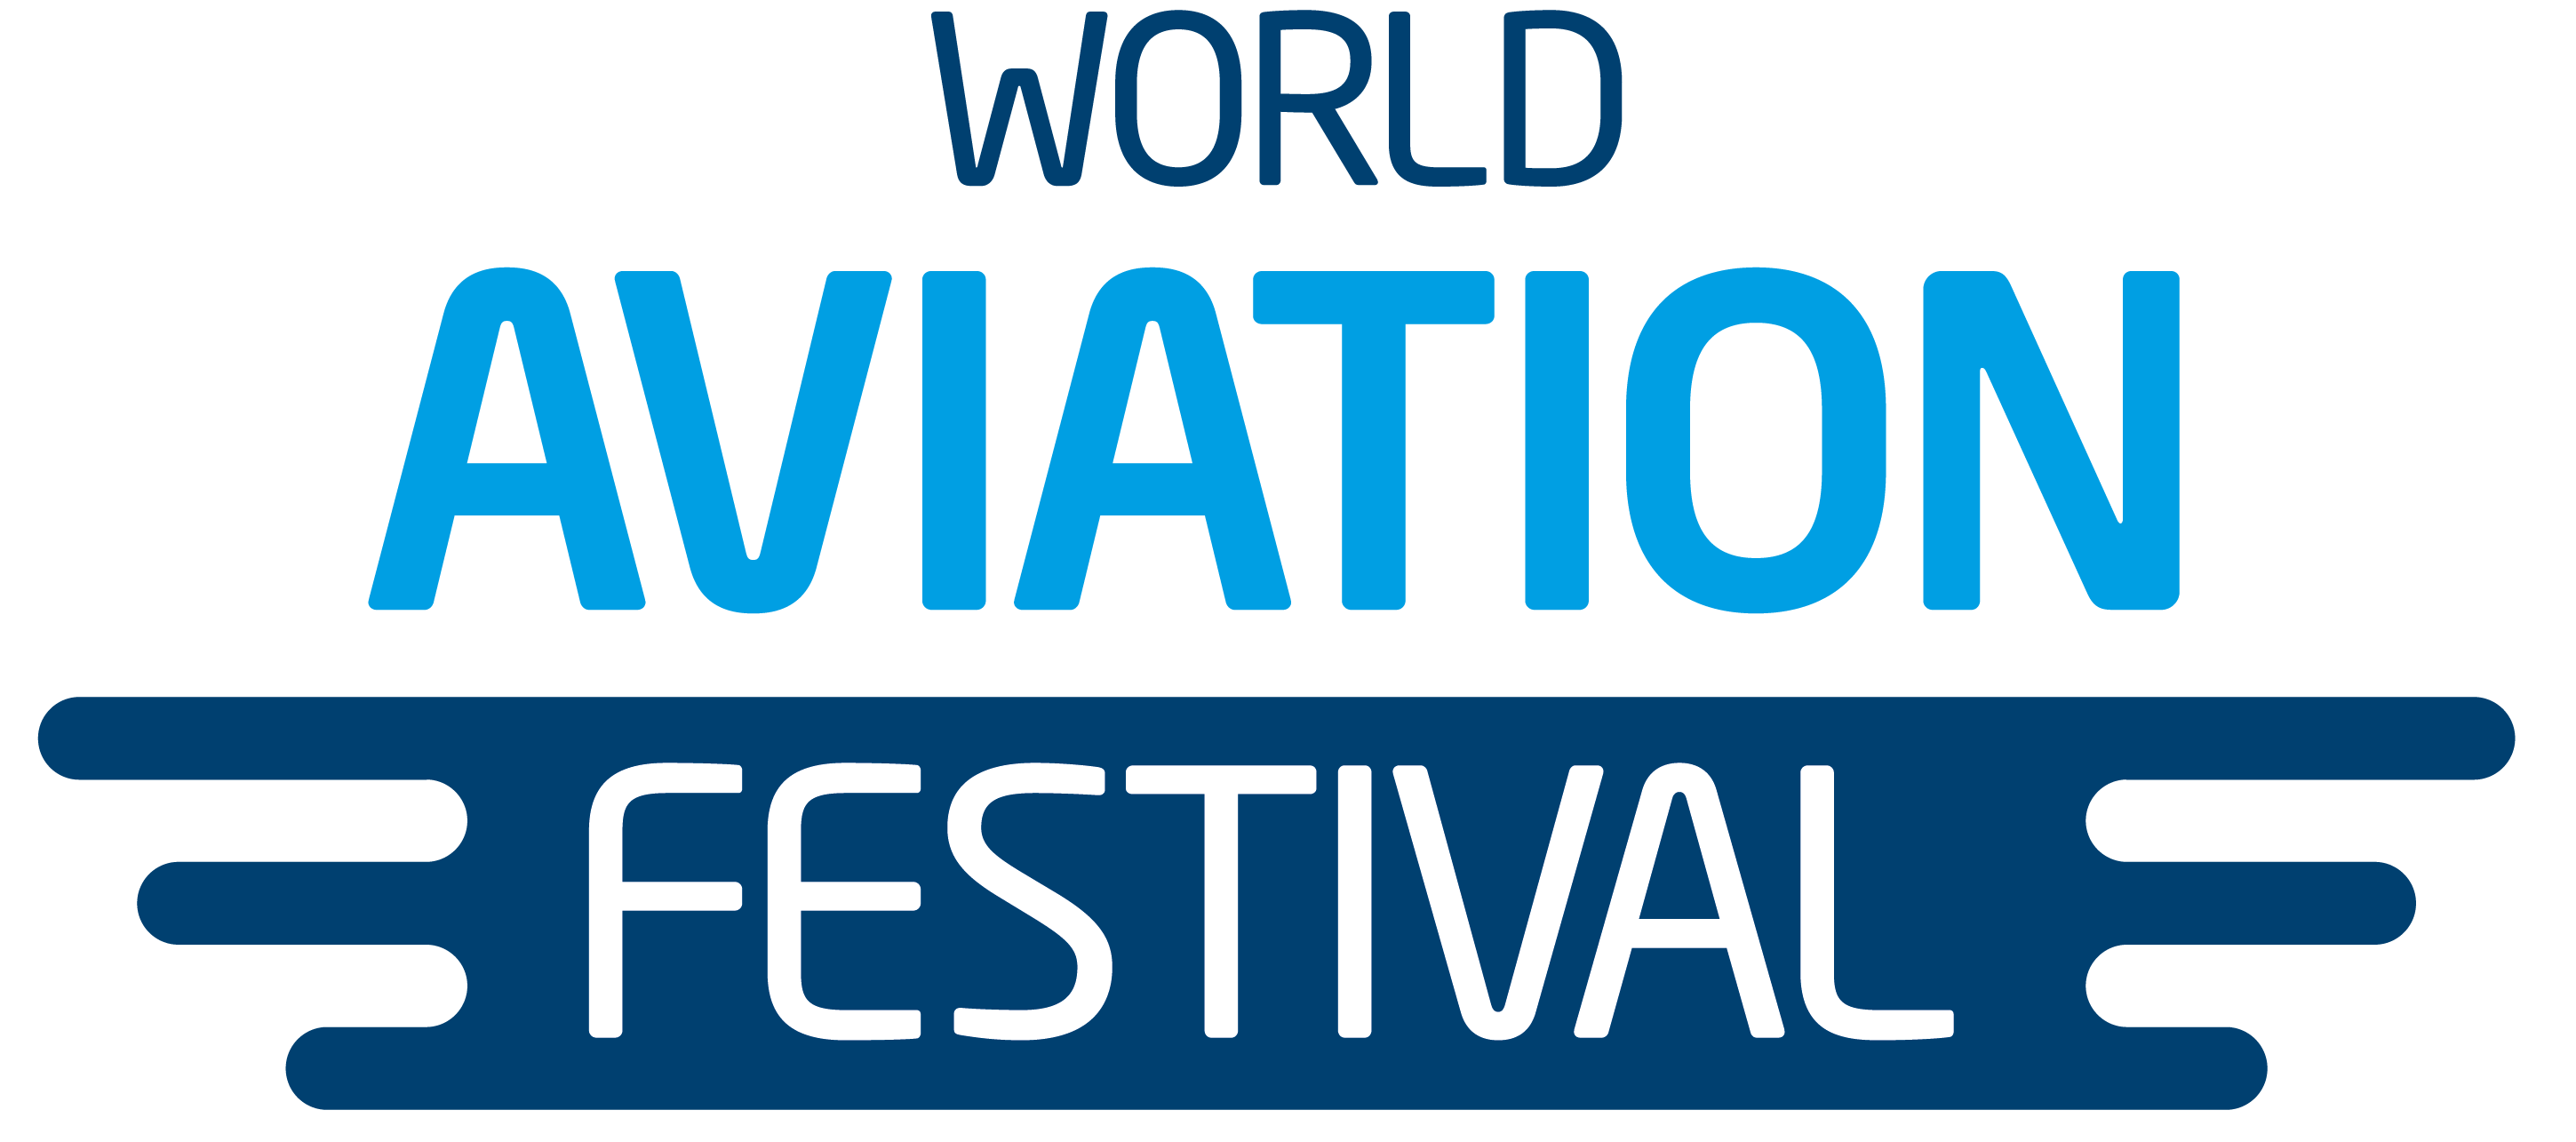 World Aviation Festival Logo